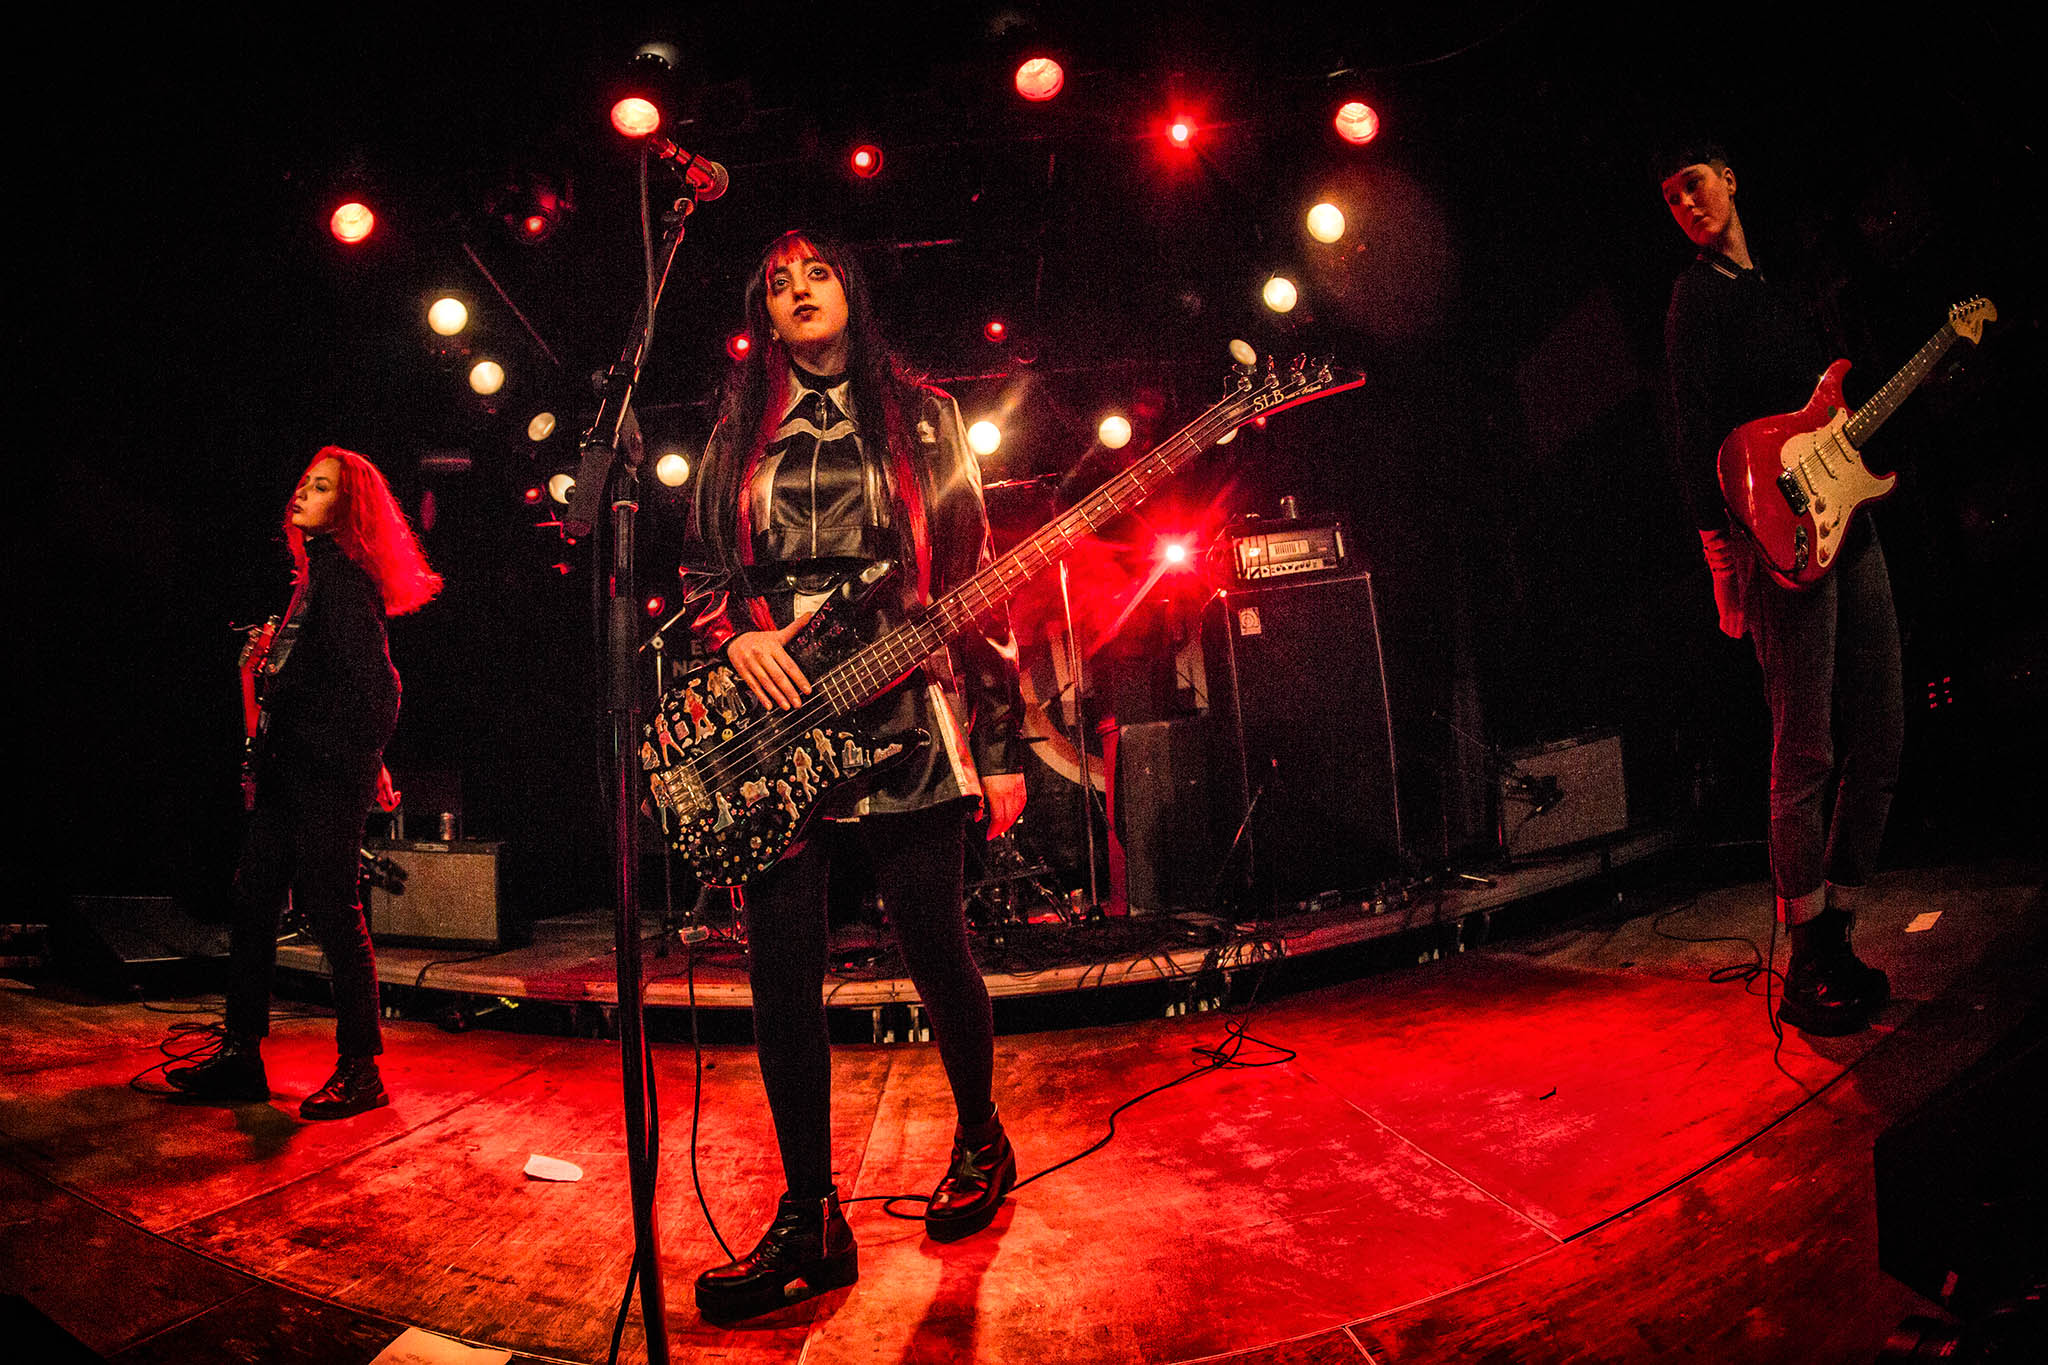 Dolores Haze - die größte Enttäuschung des Eurosonic Festivals 2016.